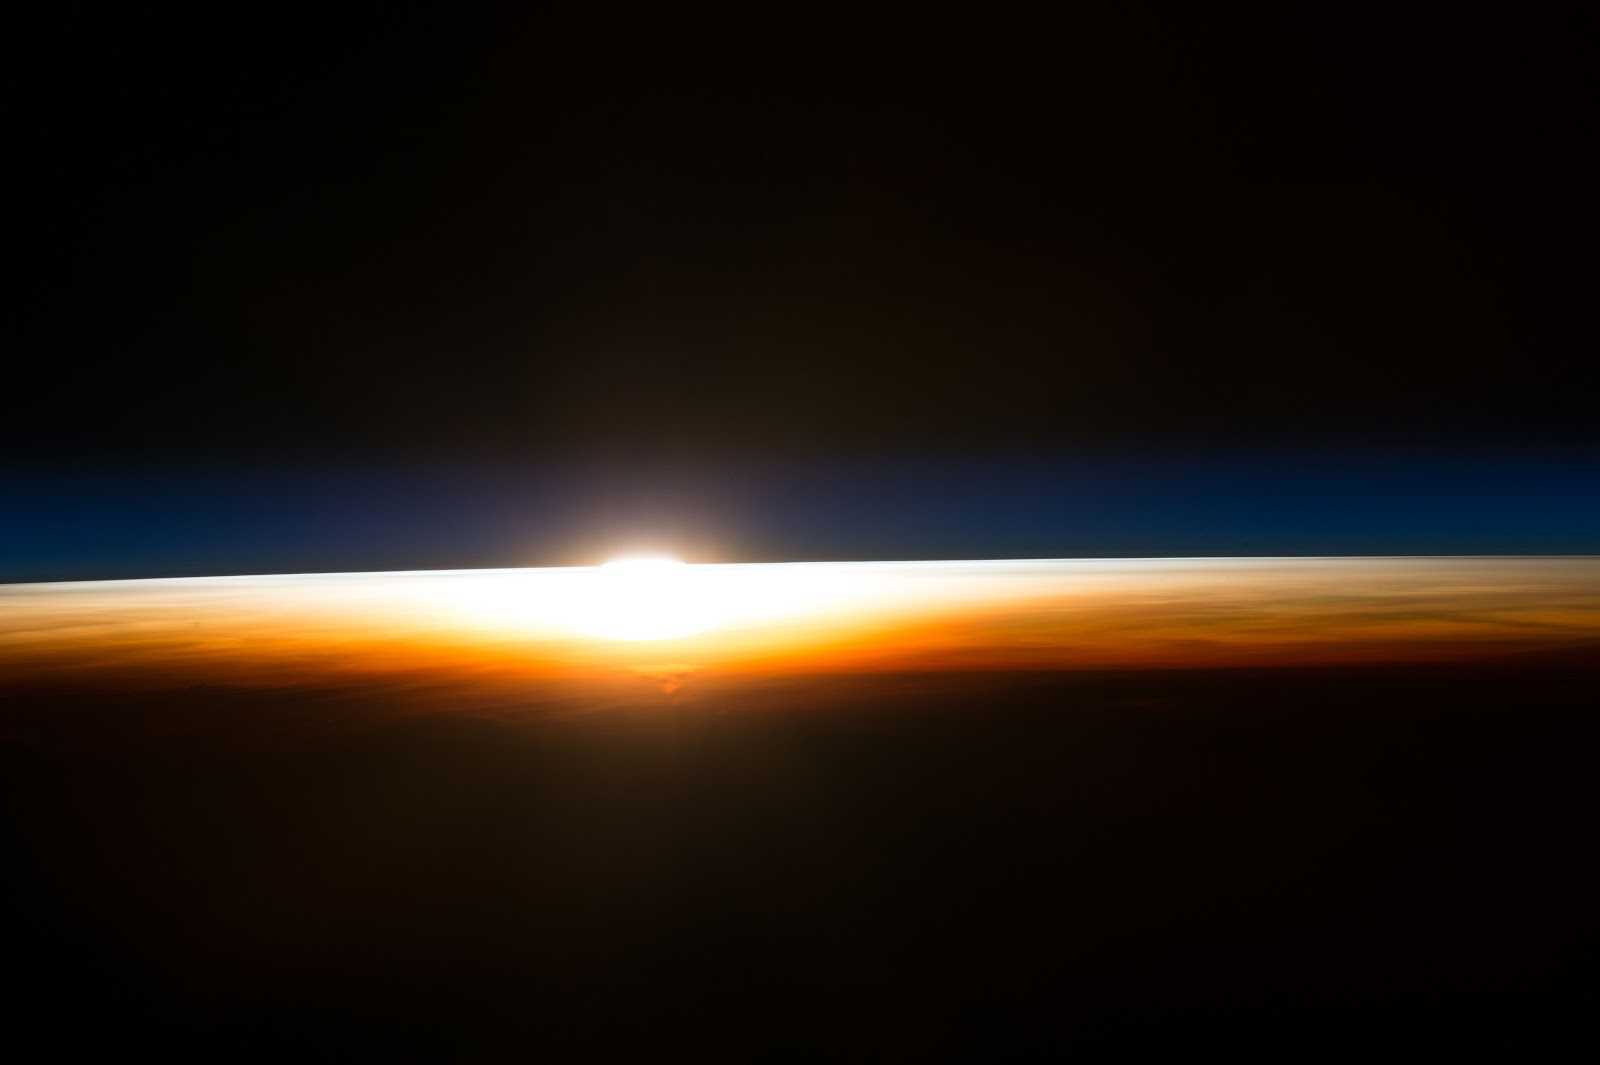 sunrise from international space station - photo #43